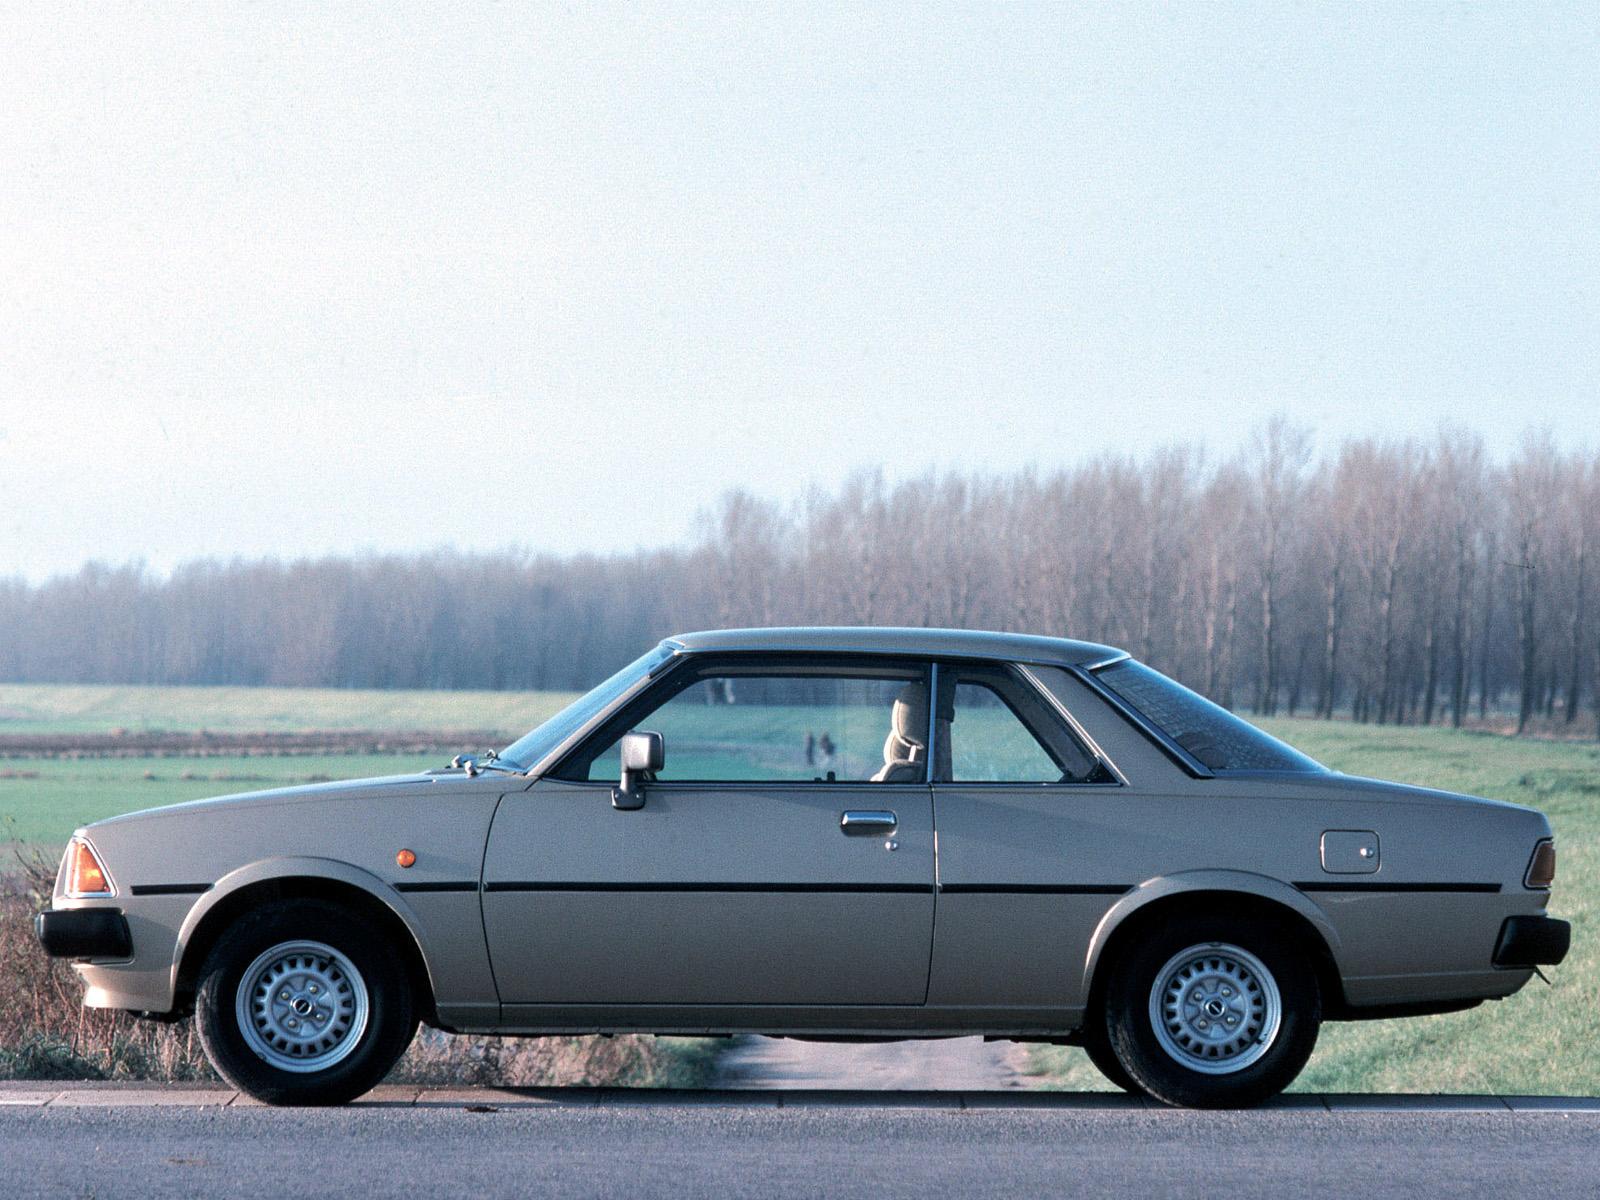 Mazda 626 I (CB) 1978 - 1982 Sedan #7